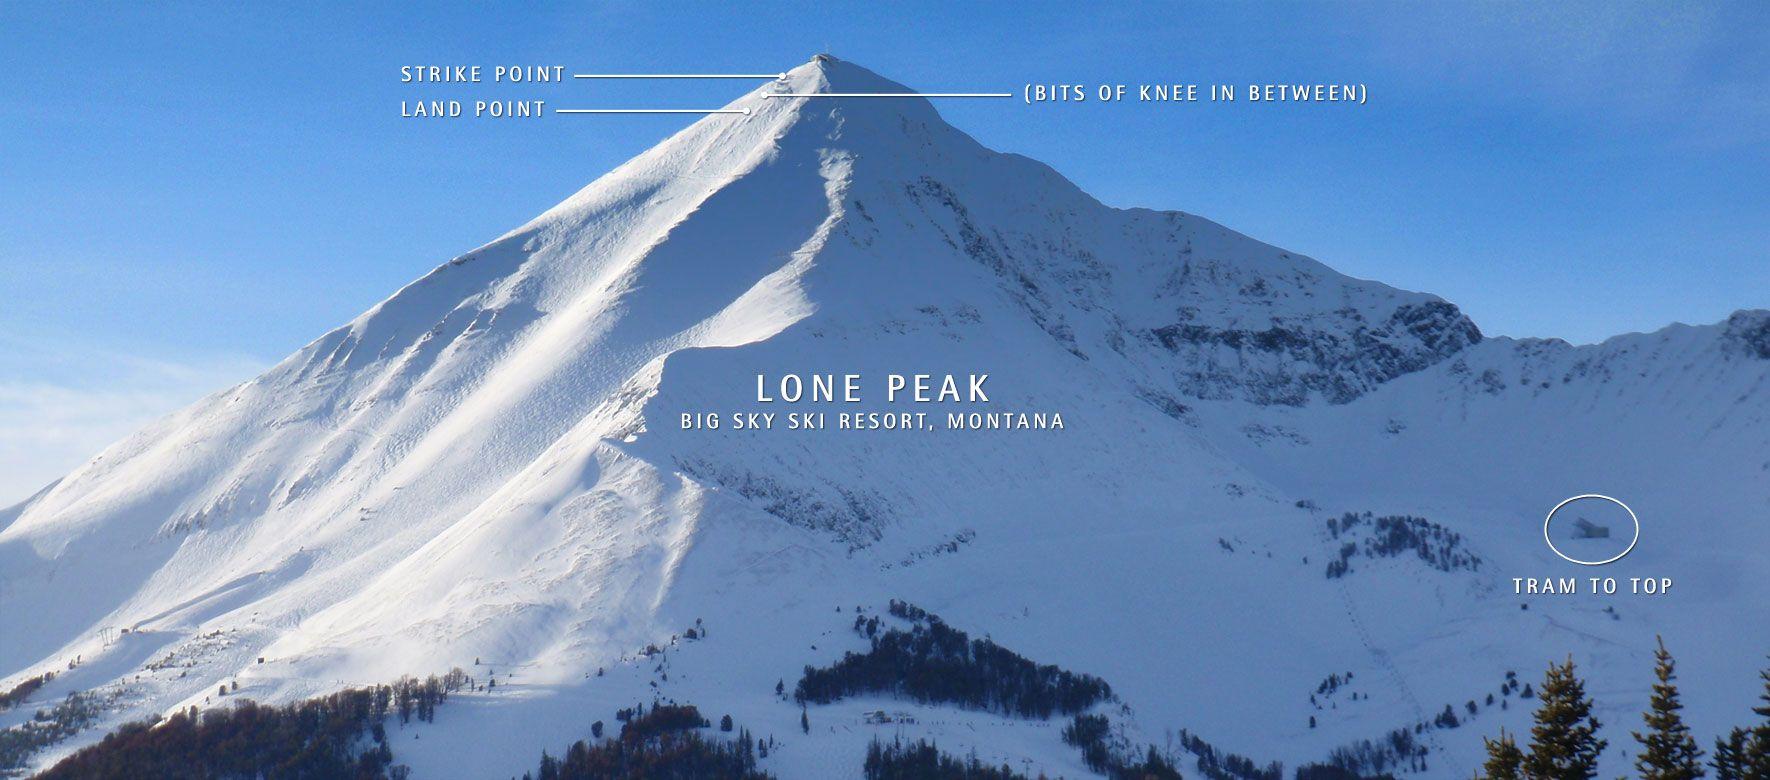 Lone Mountain Peak Big Sky Google Search Big Sky Ski White Sky Big Sky [ 780 x 1770 Pixel ]